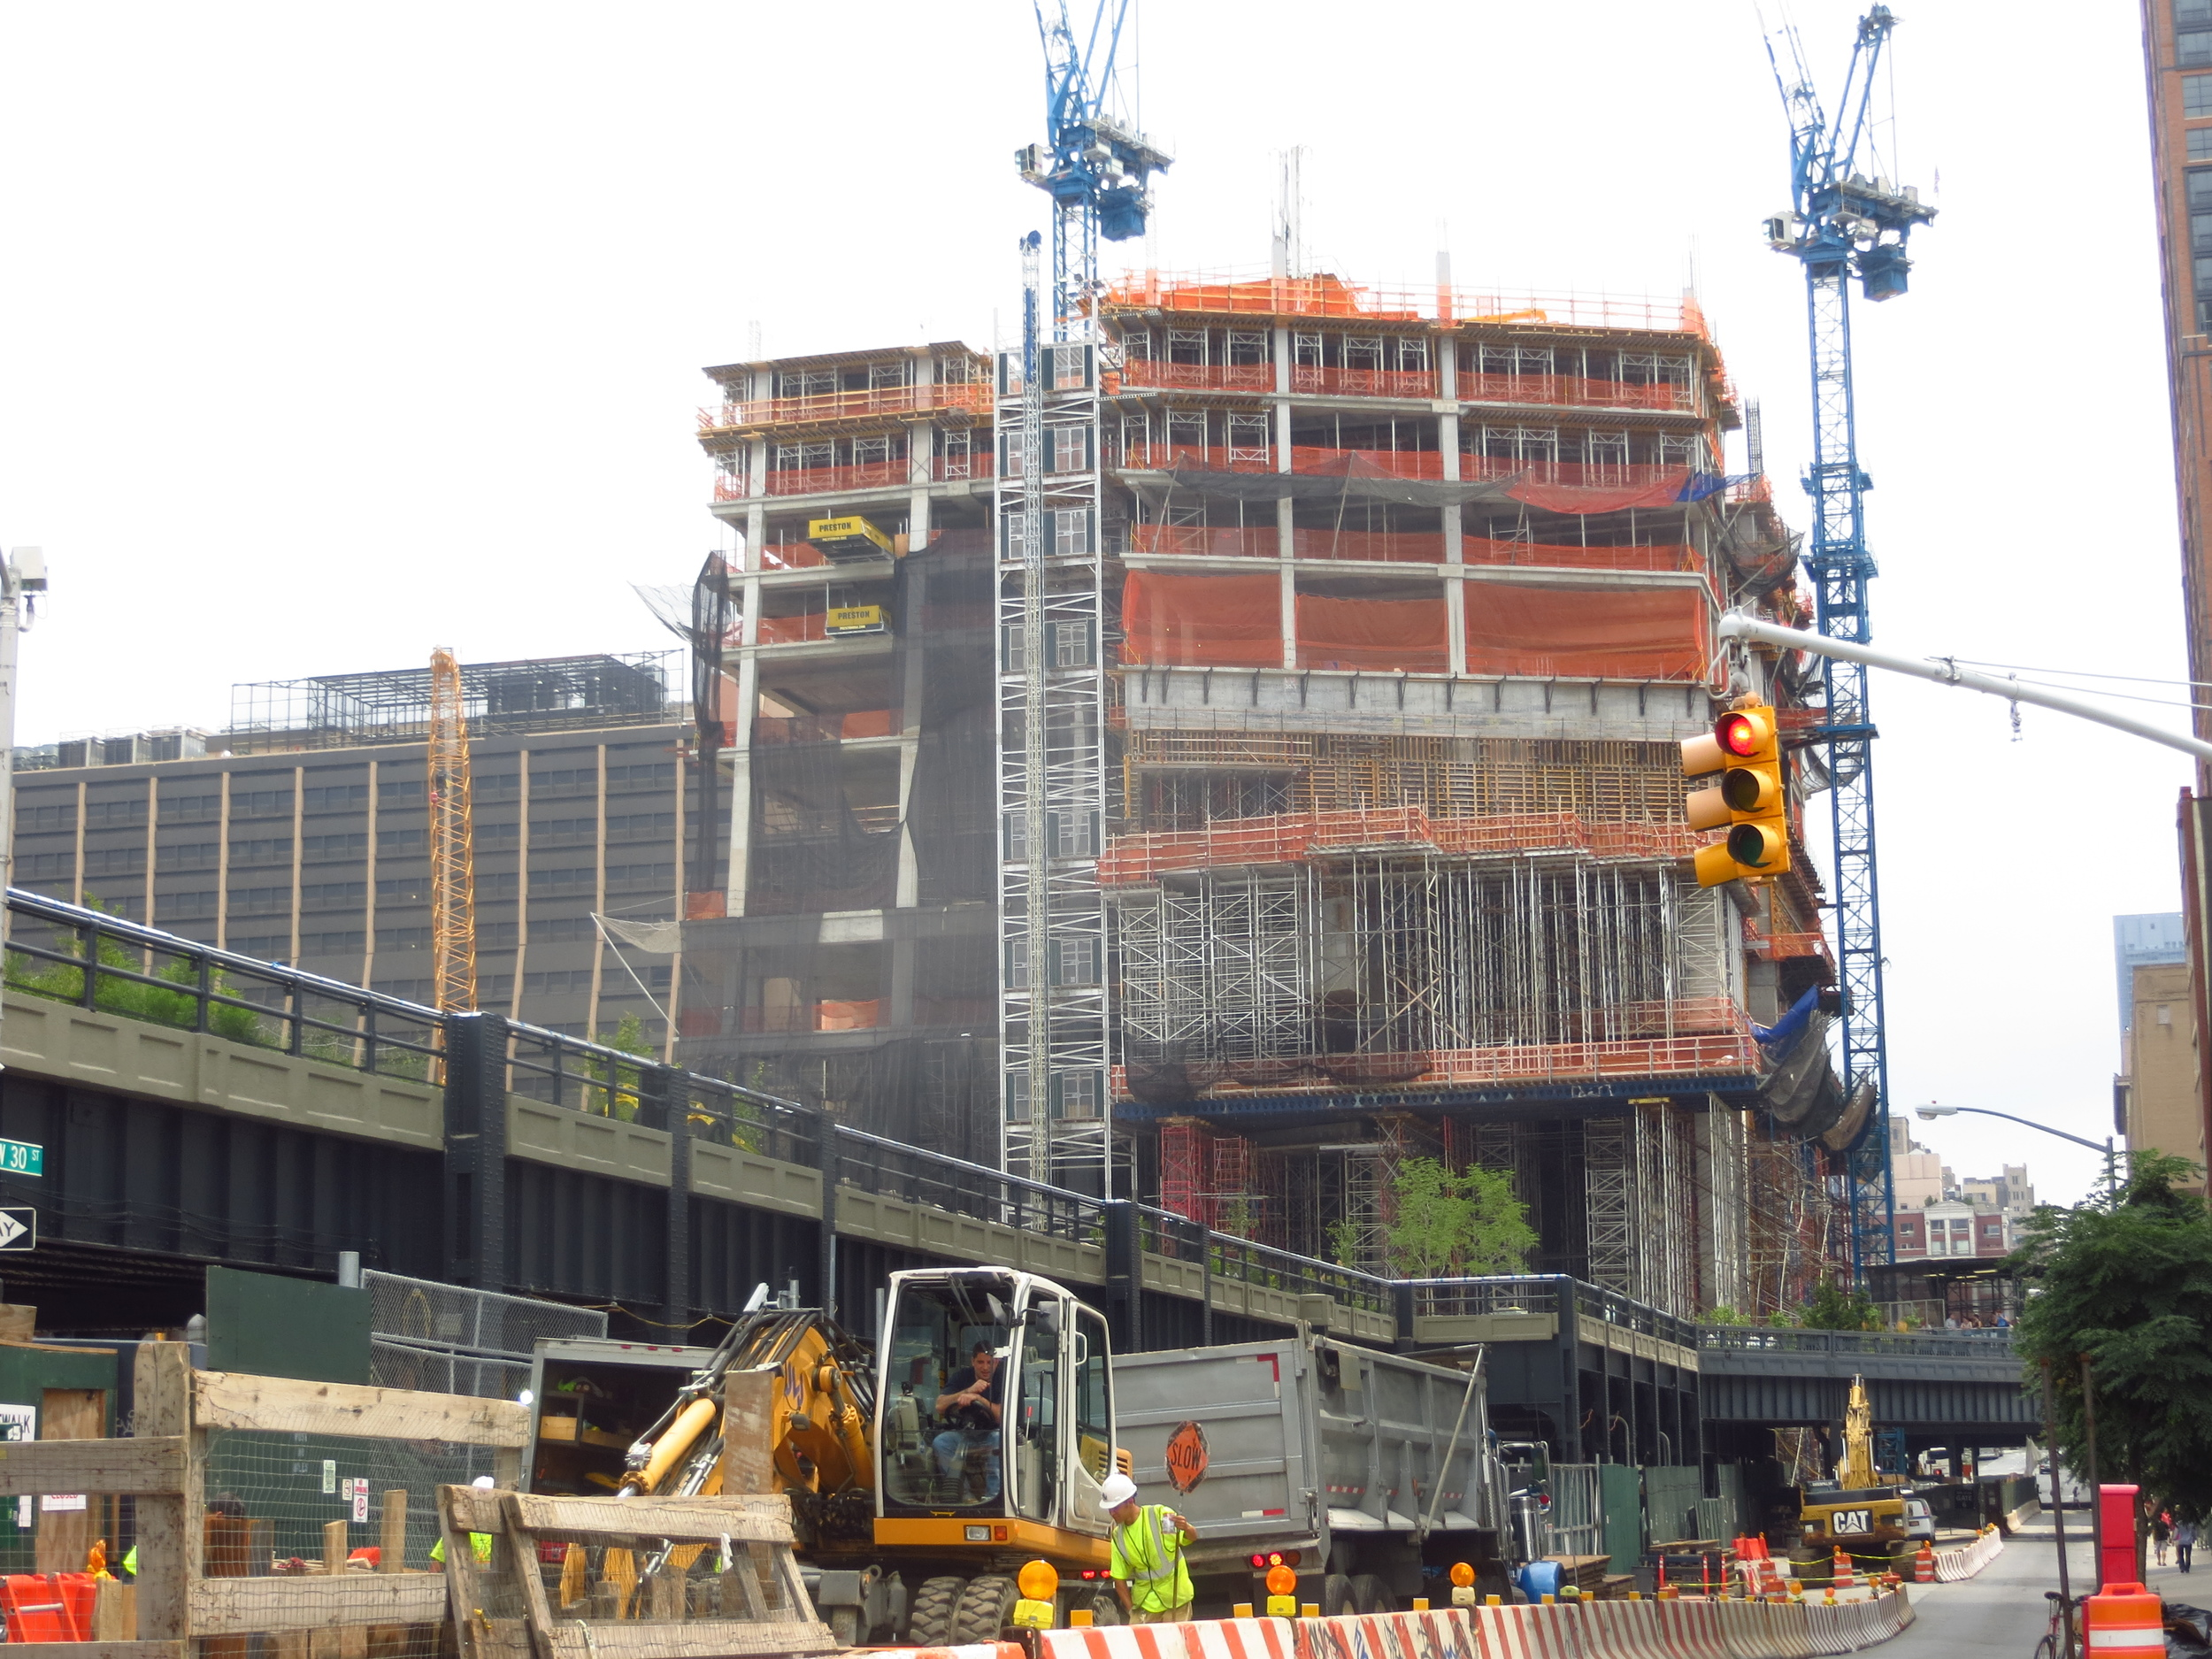 New Highline Park section under construction